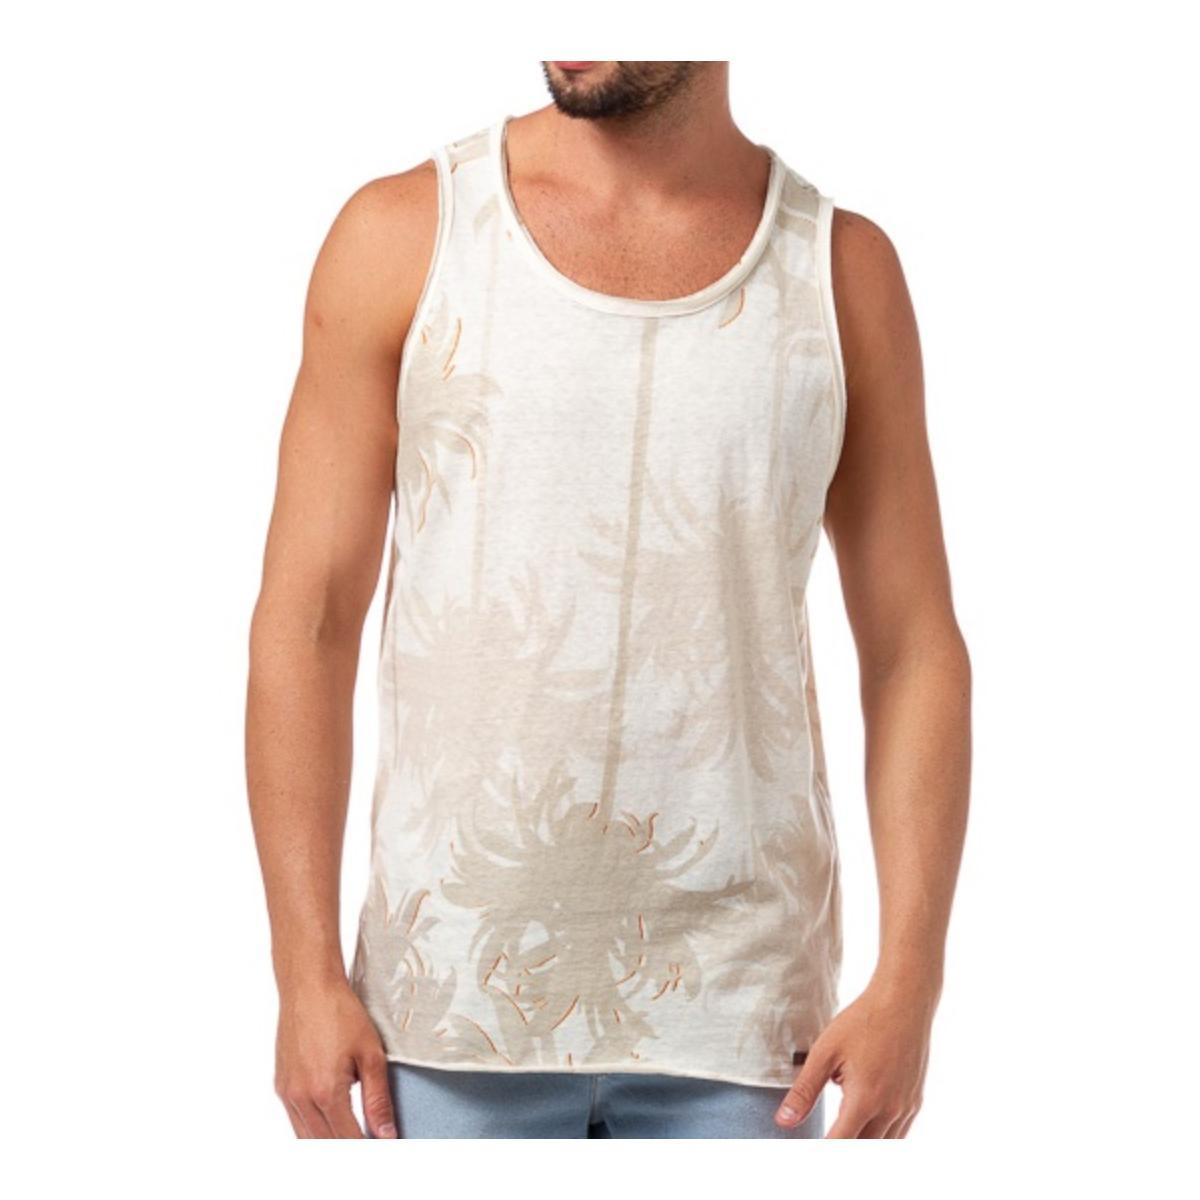 Regata Masculina Coca-cola Clothing 393200789 Off White/bege Estampado